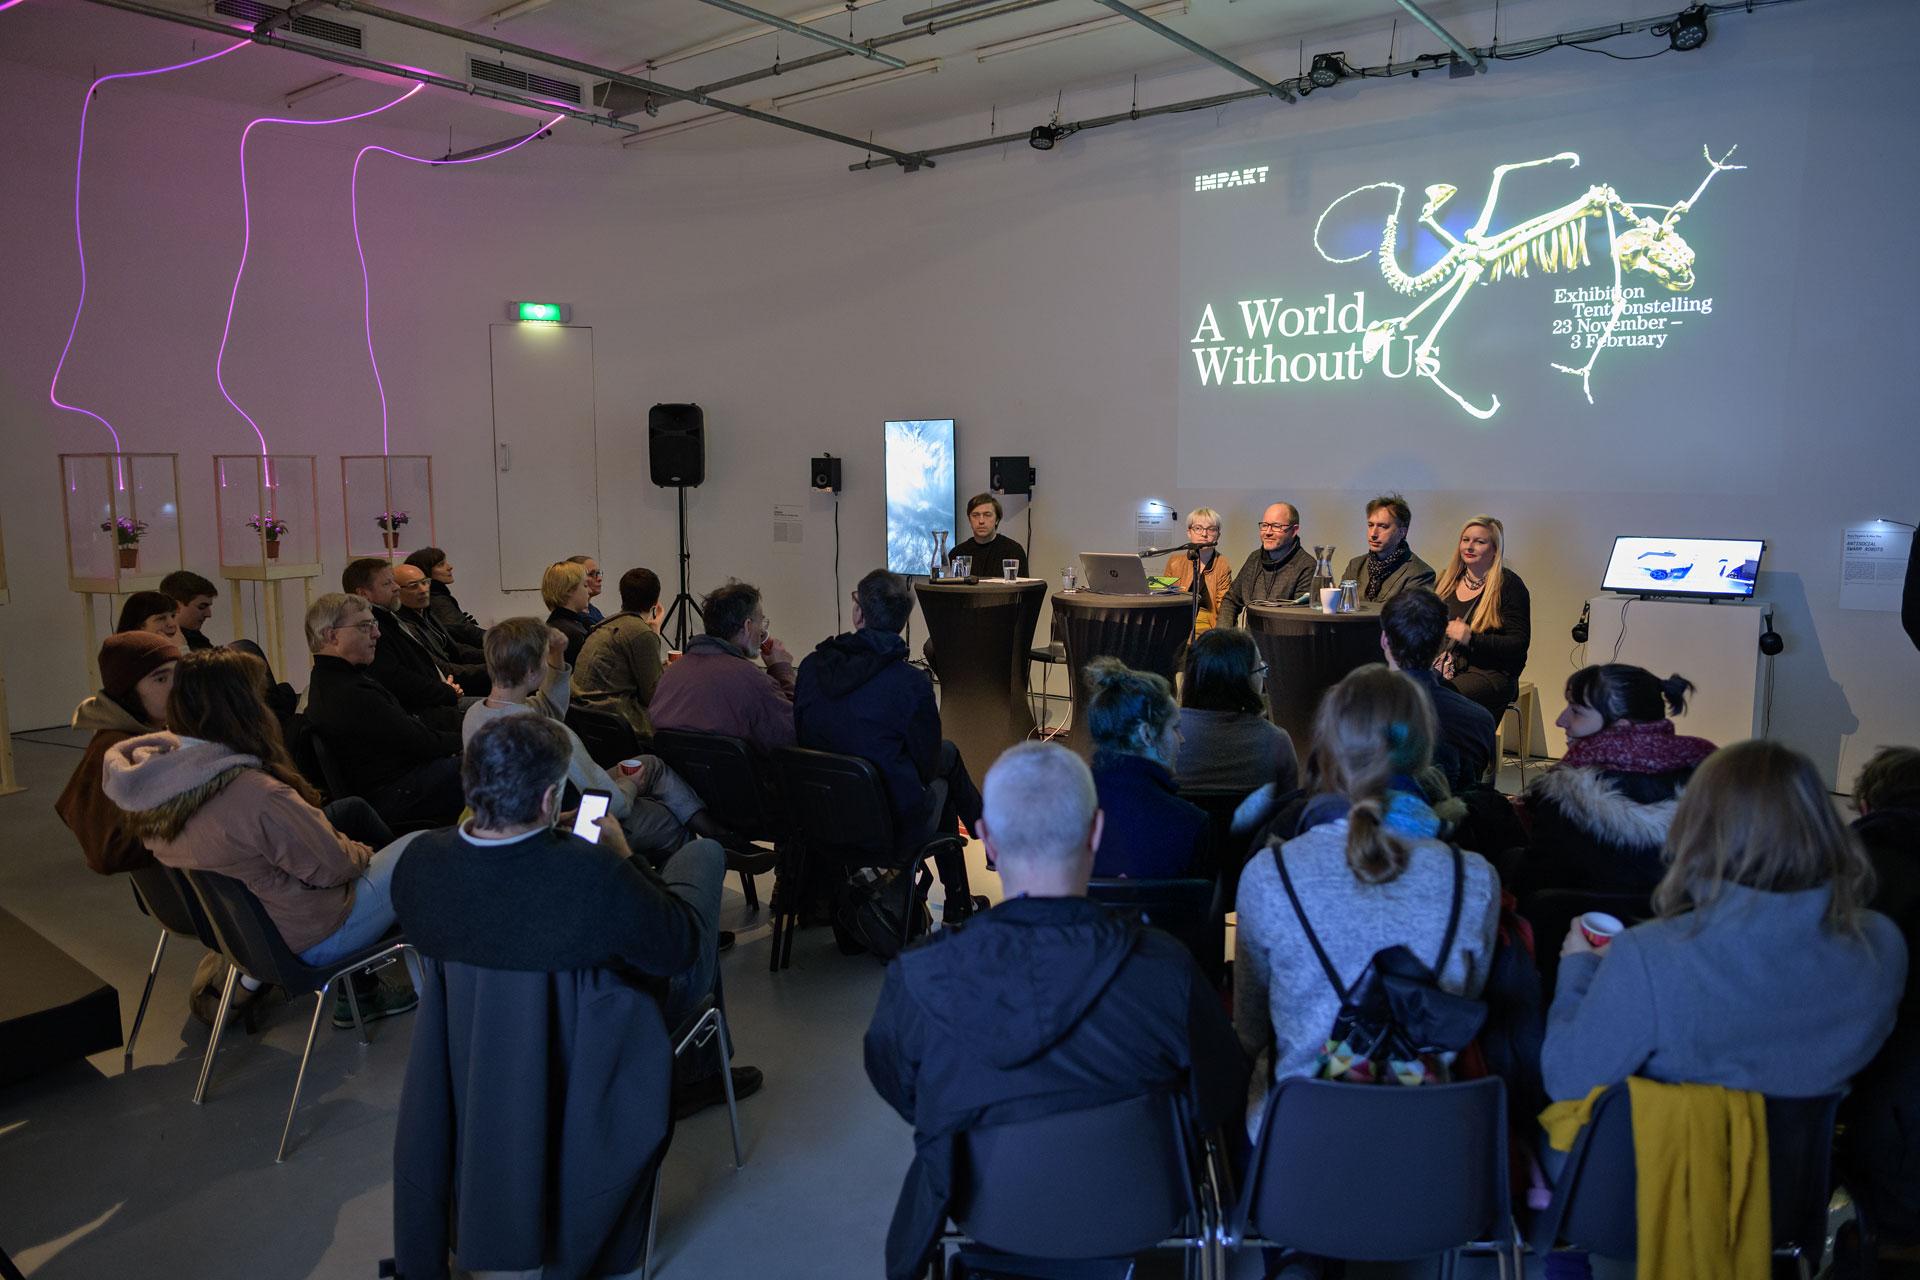 Impakt artist talk tentoonstelling  'a world without us'; www.im